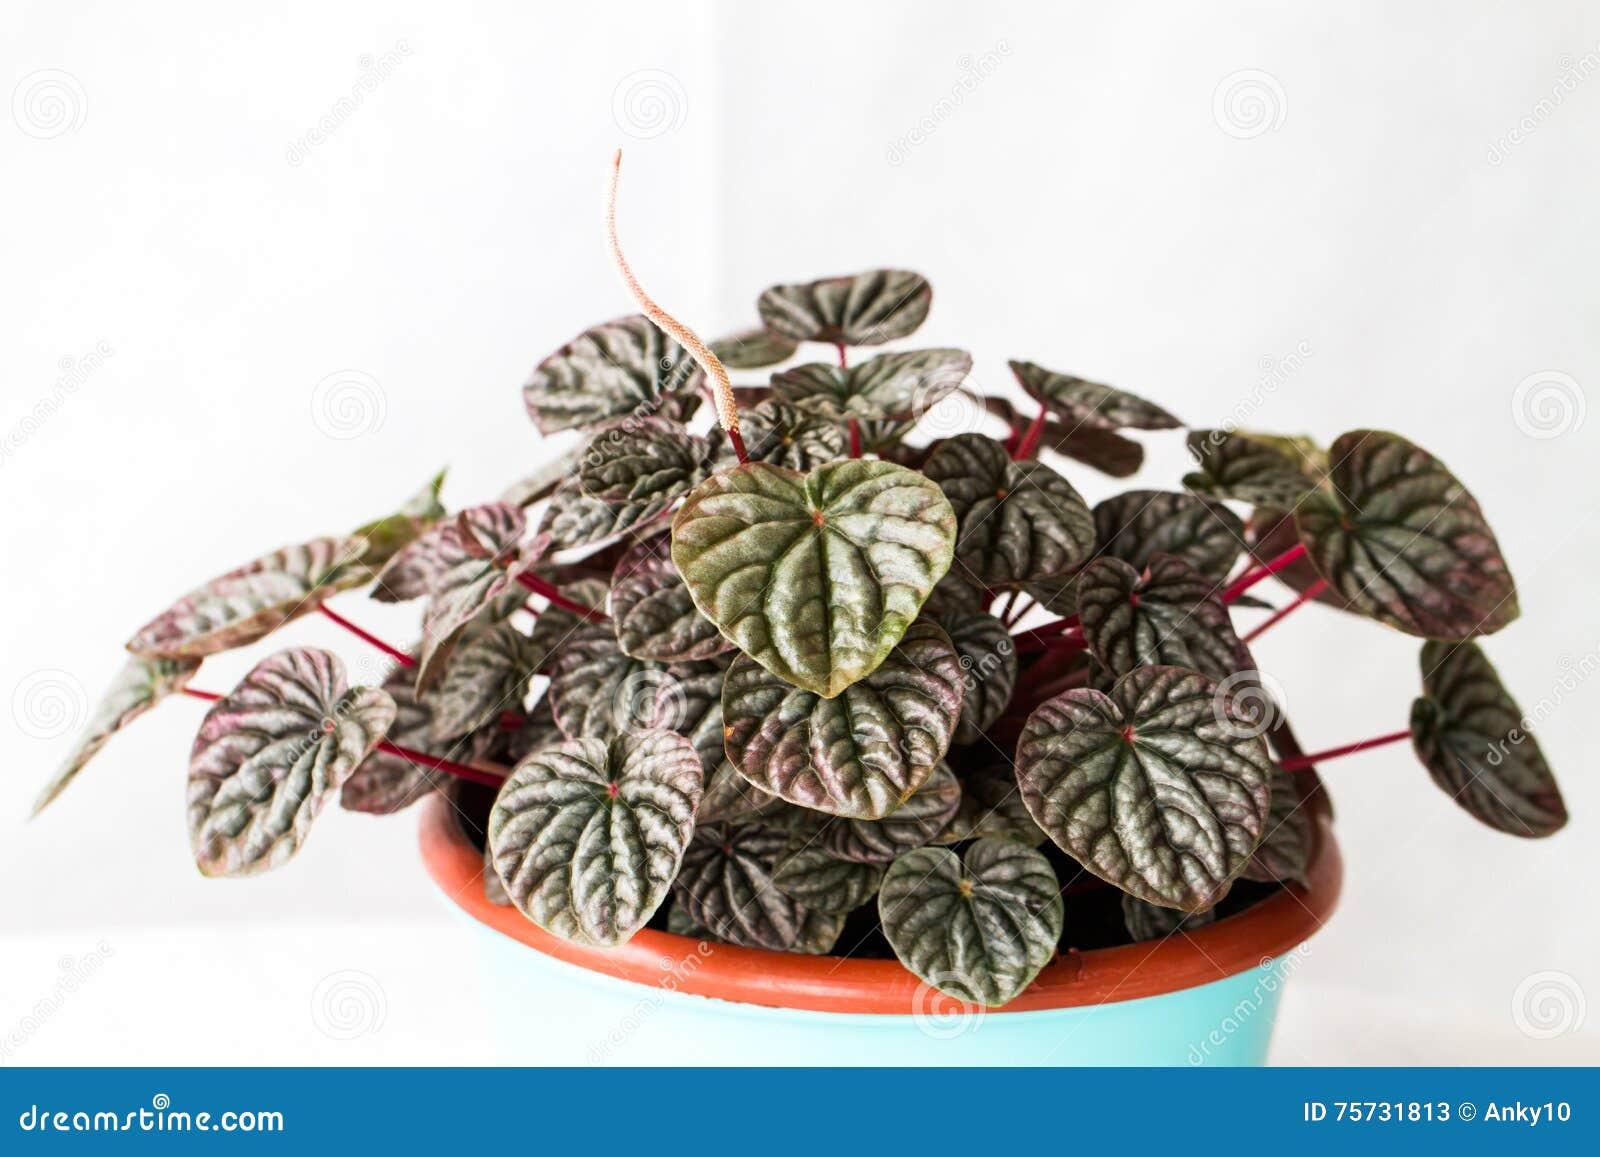 Houseplants Senecio Cylindricus Stock Image - Image of ... on narrow leaf hostas, narrow leaf evergreens, narrow leaf trees, narrow leaf grass, narrow leaf shrubs,